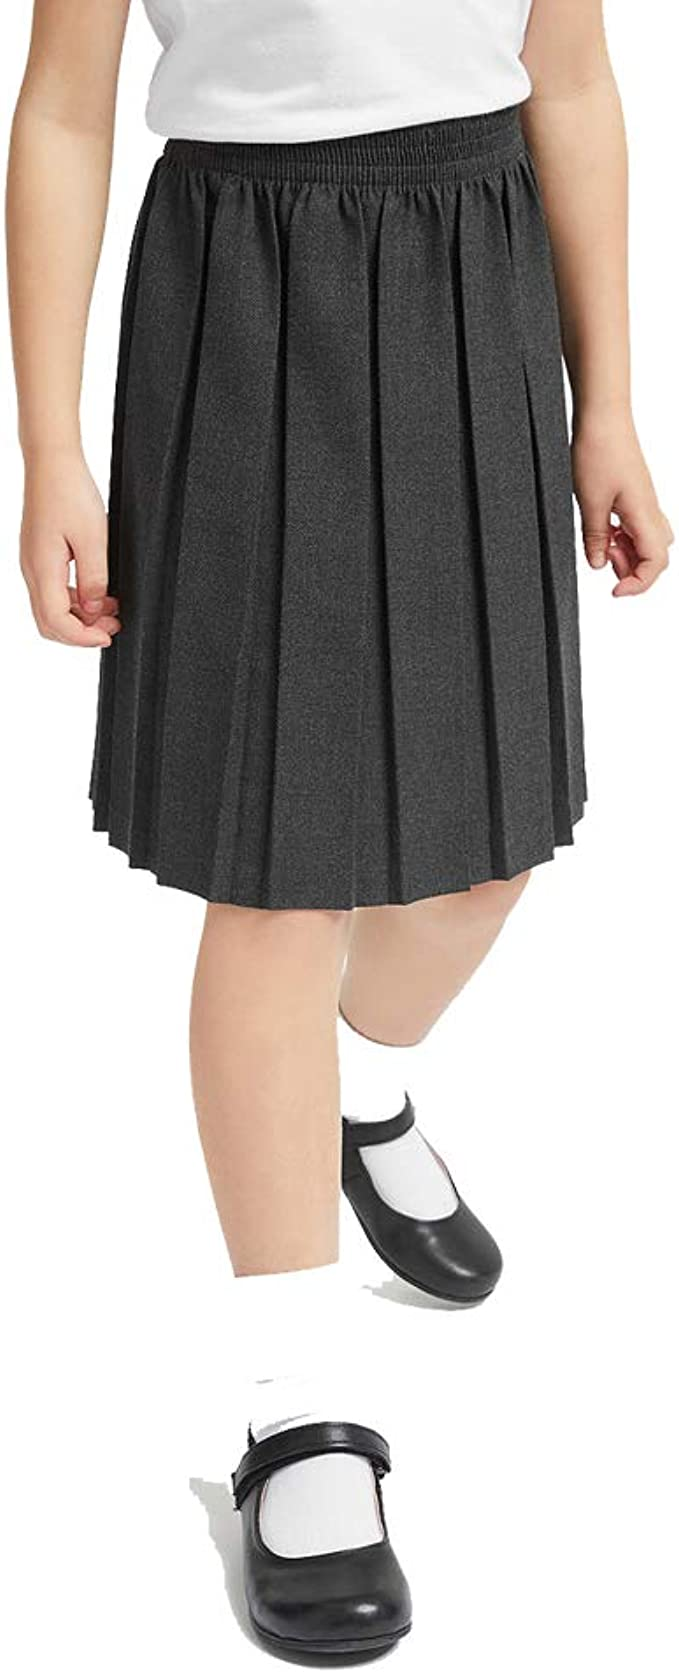 Owasi - Falda Plisada para Colegio, Lisa, Uniforme Senior, Cintura ...